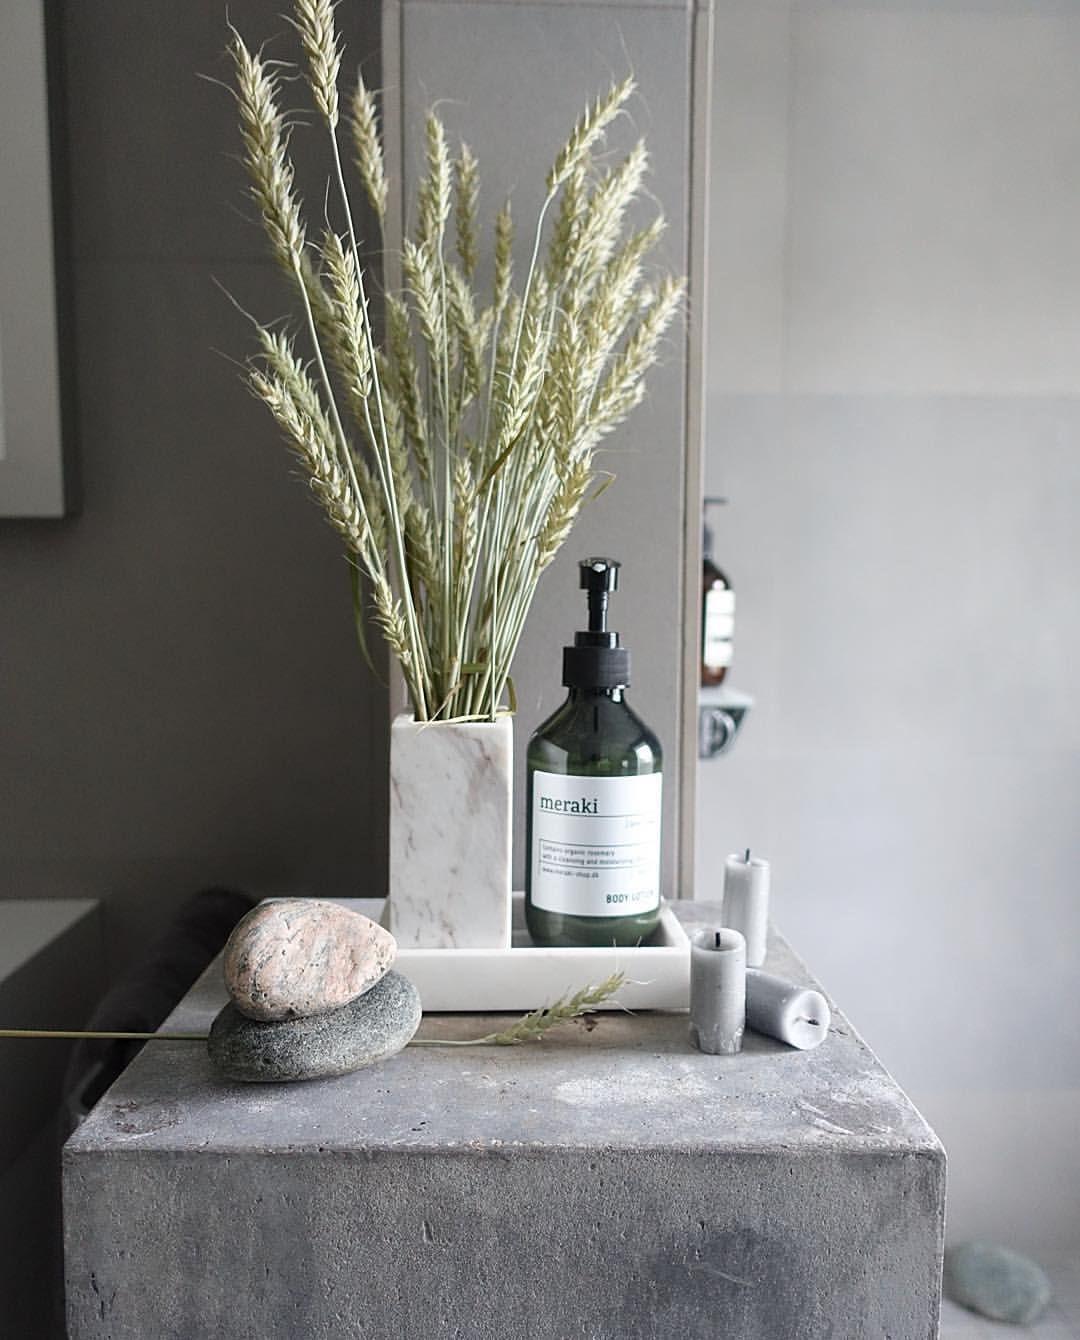 Favourite Bathroom Home Decor: Meraki - Linen Dew - My Favorite